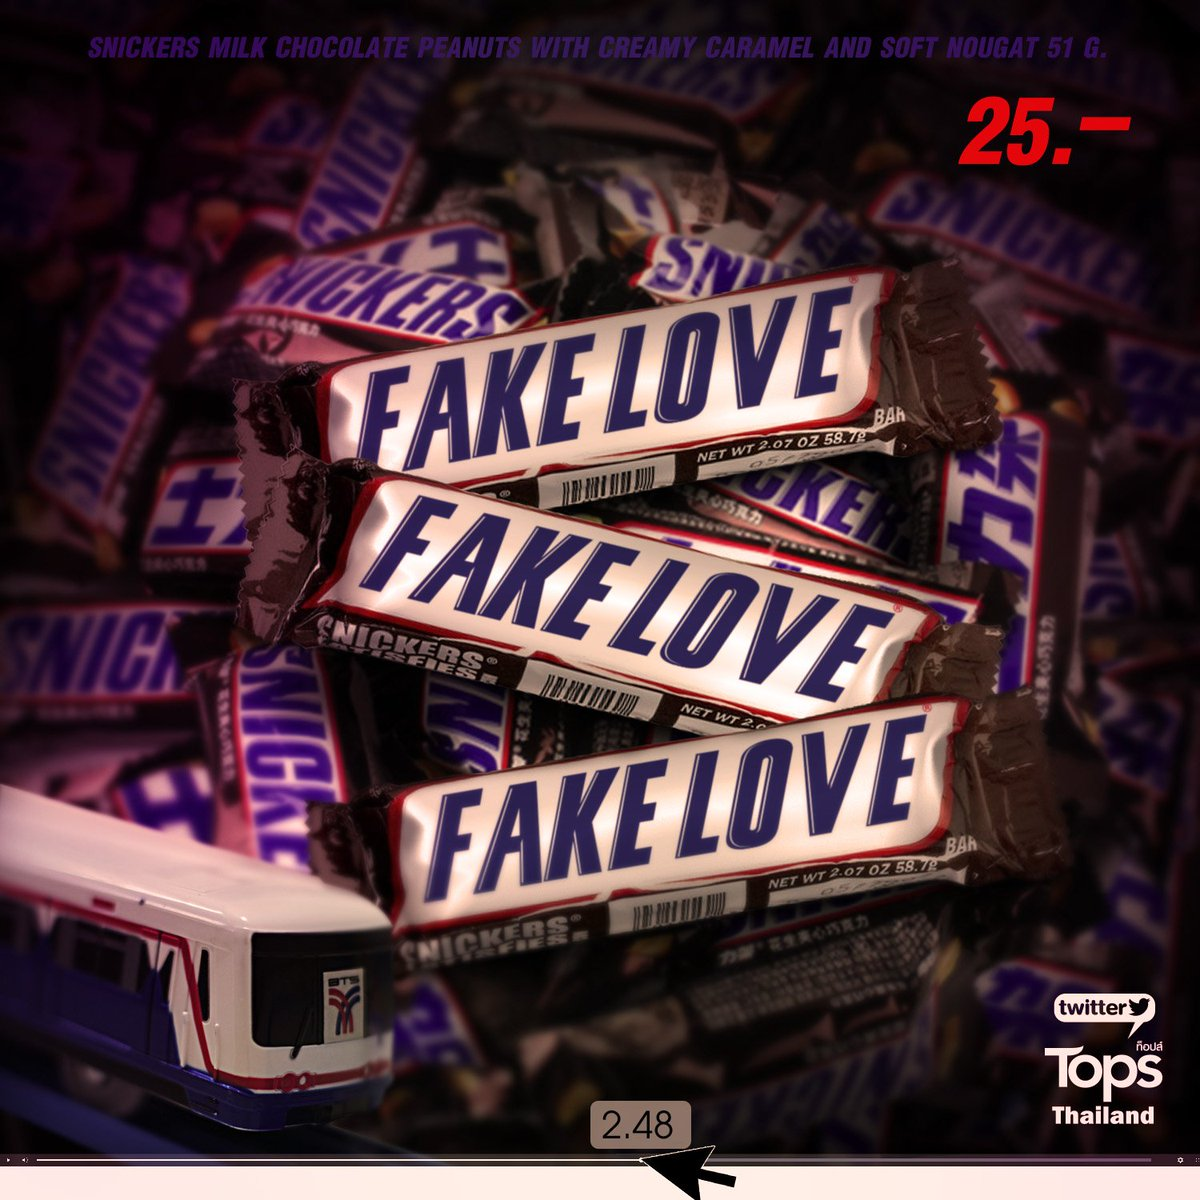 Tops Thailand's photo on #fake_love